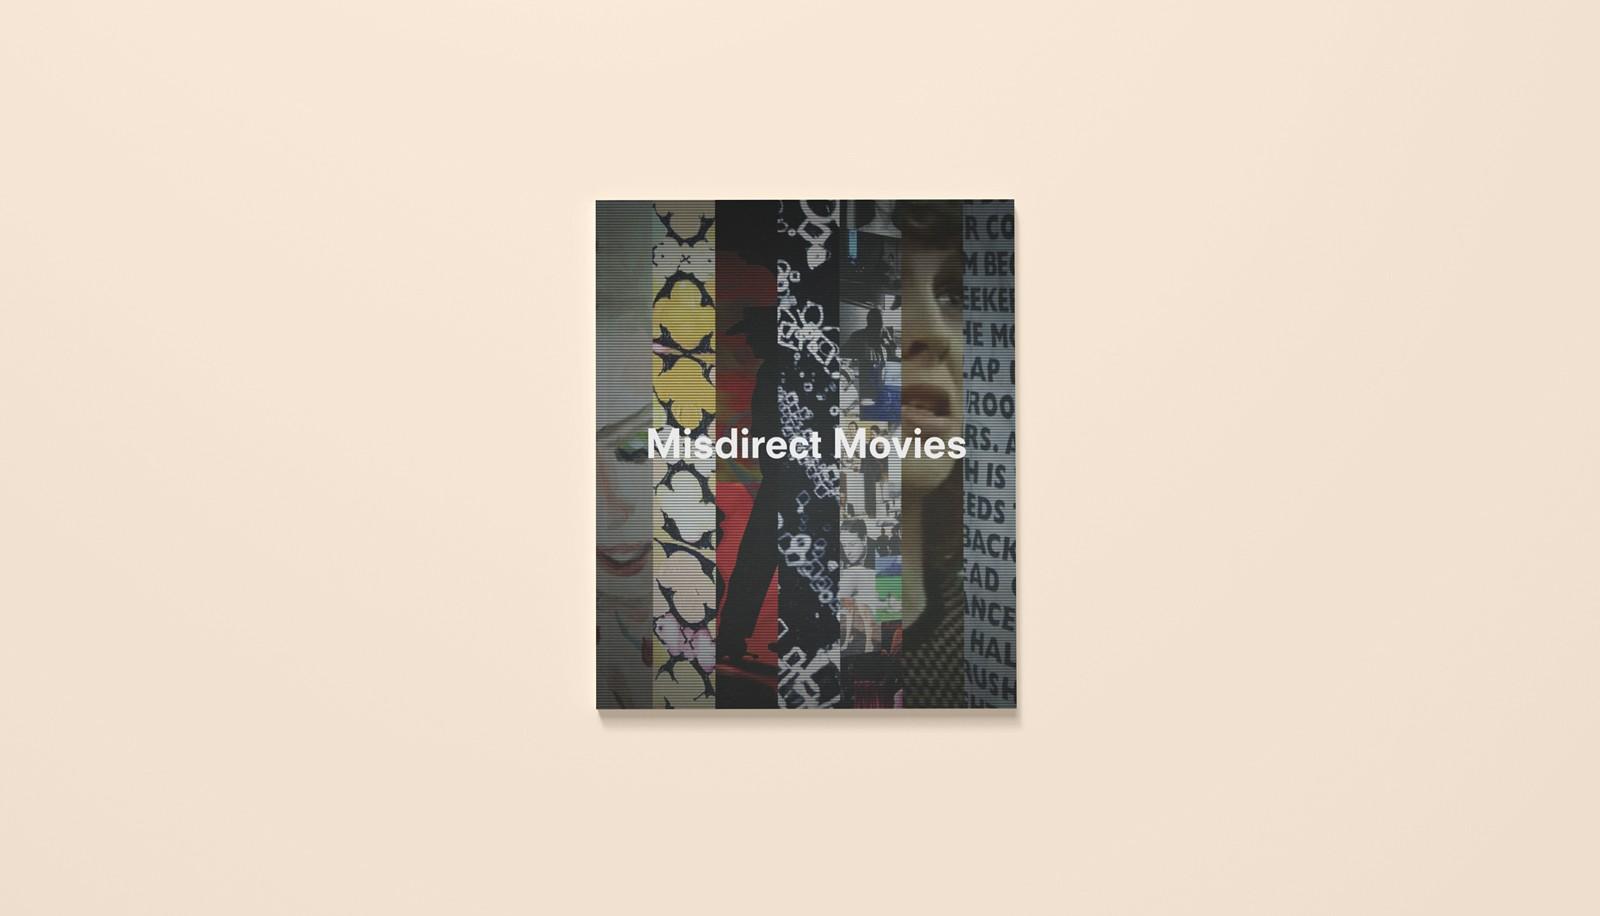 Exhibition publication: Misdirect Movies